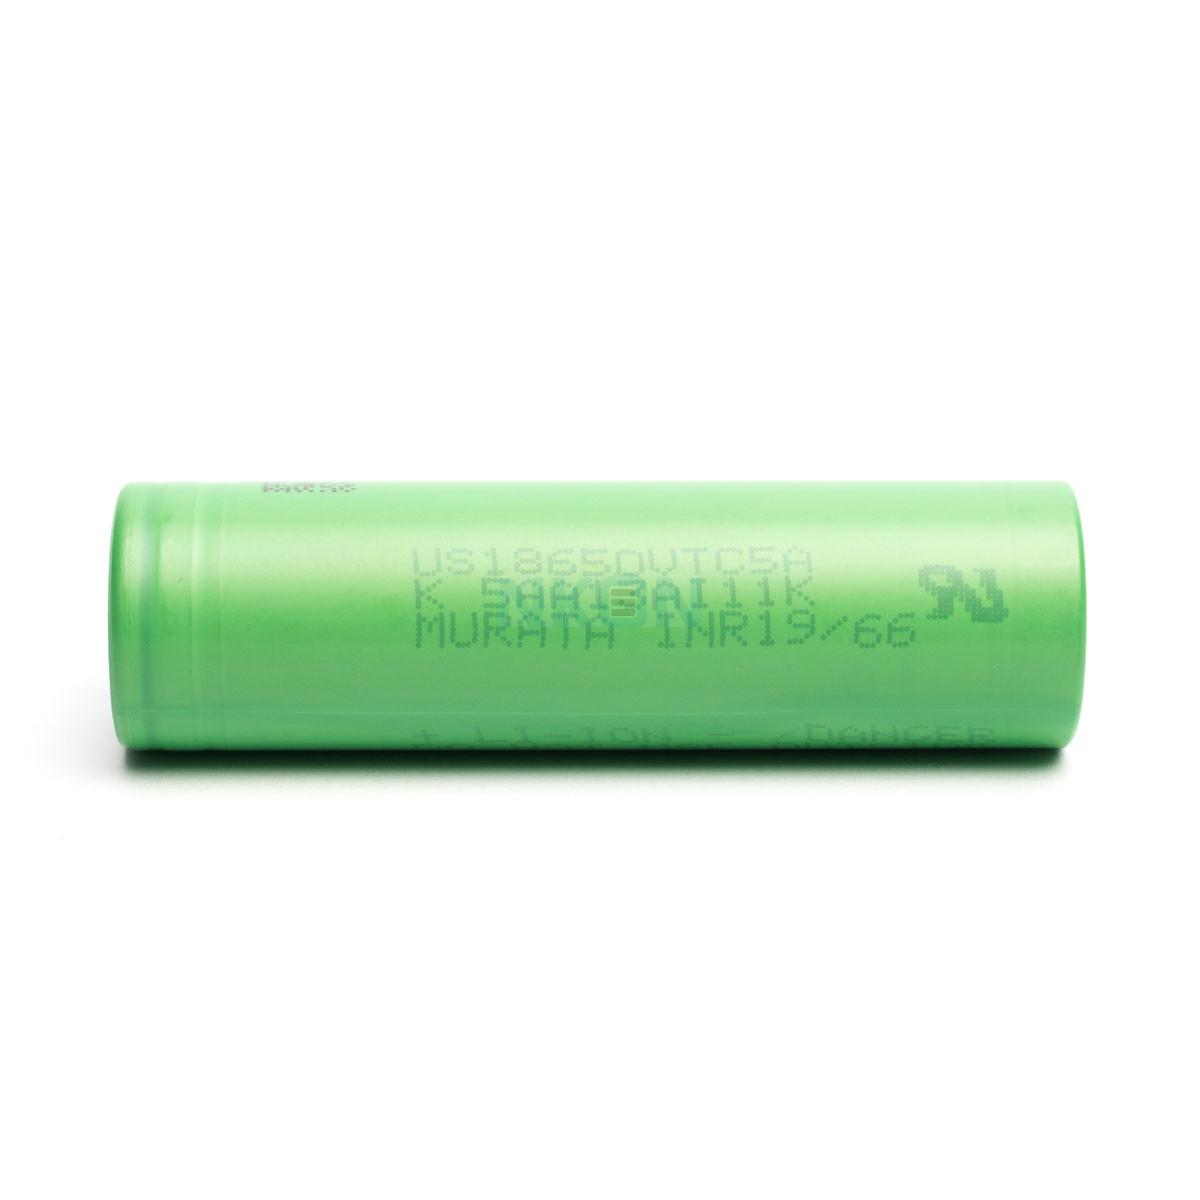 Bateria 18650 INR US 18650 VTC5A 3.6V 2500mAh High Drain 25A Flat Top - Sony